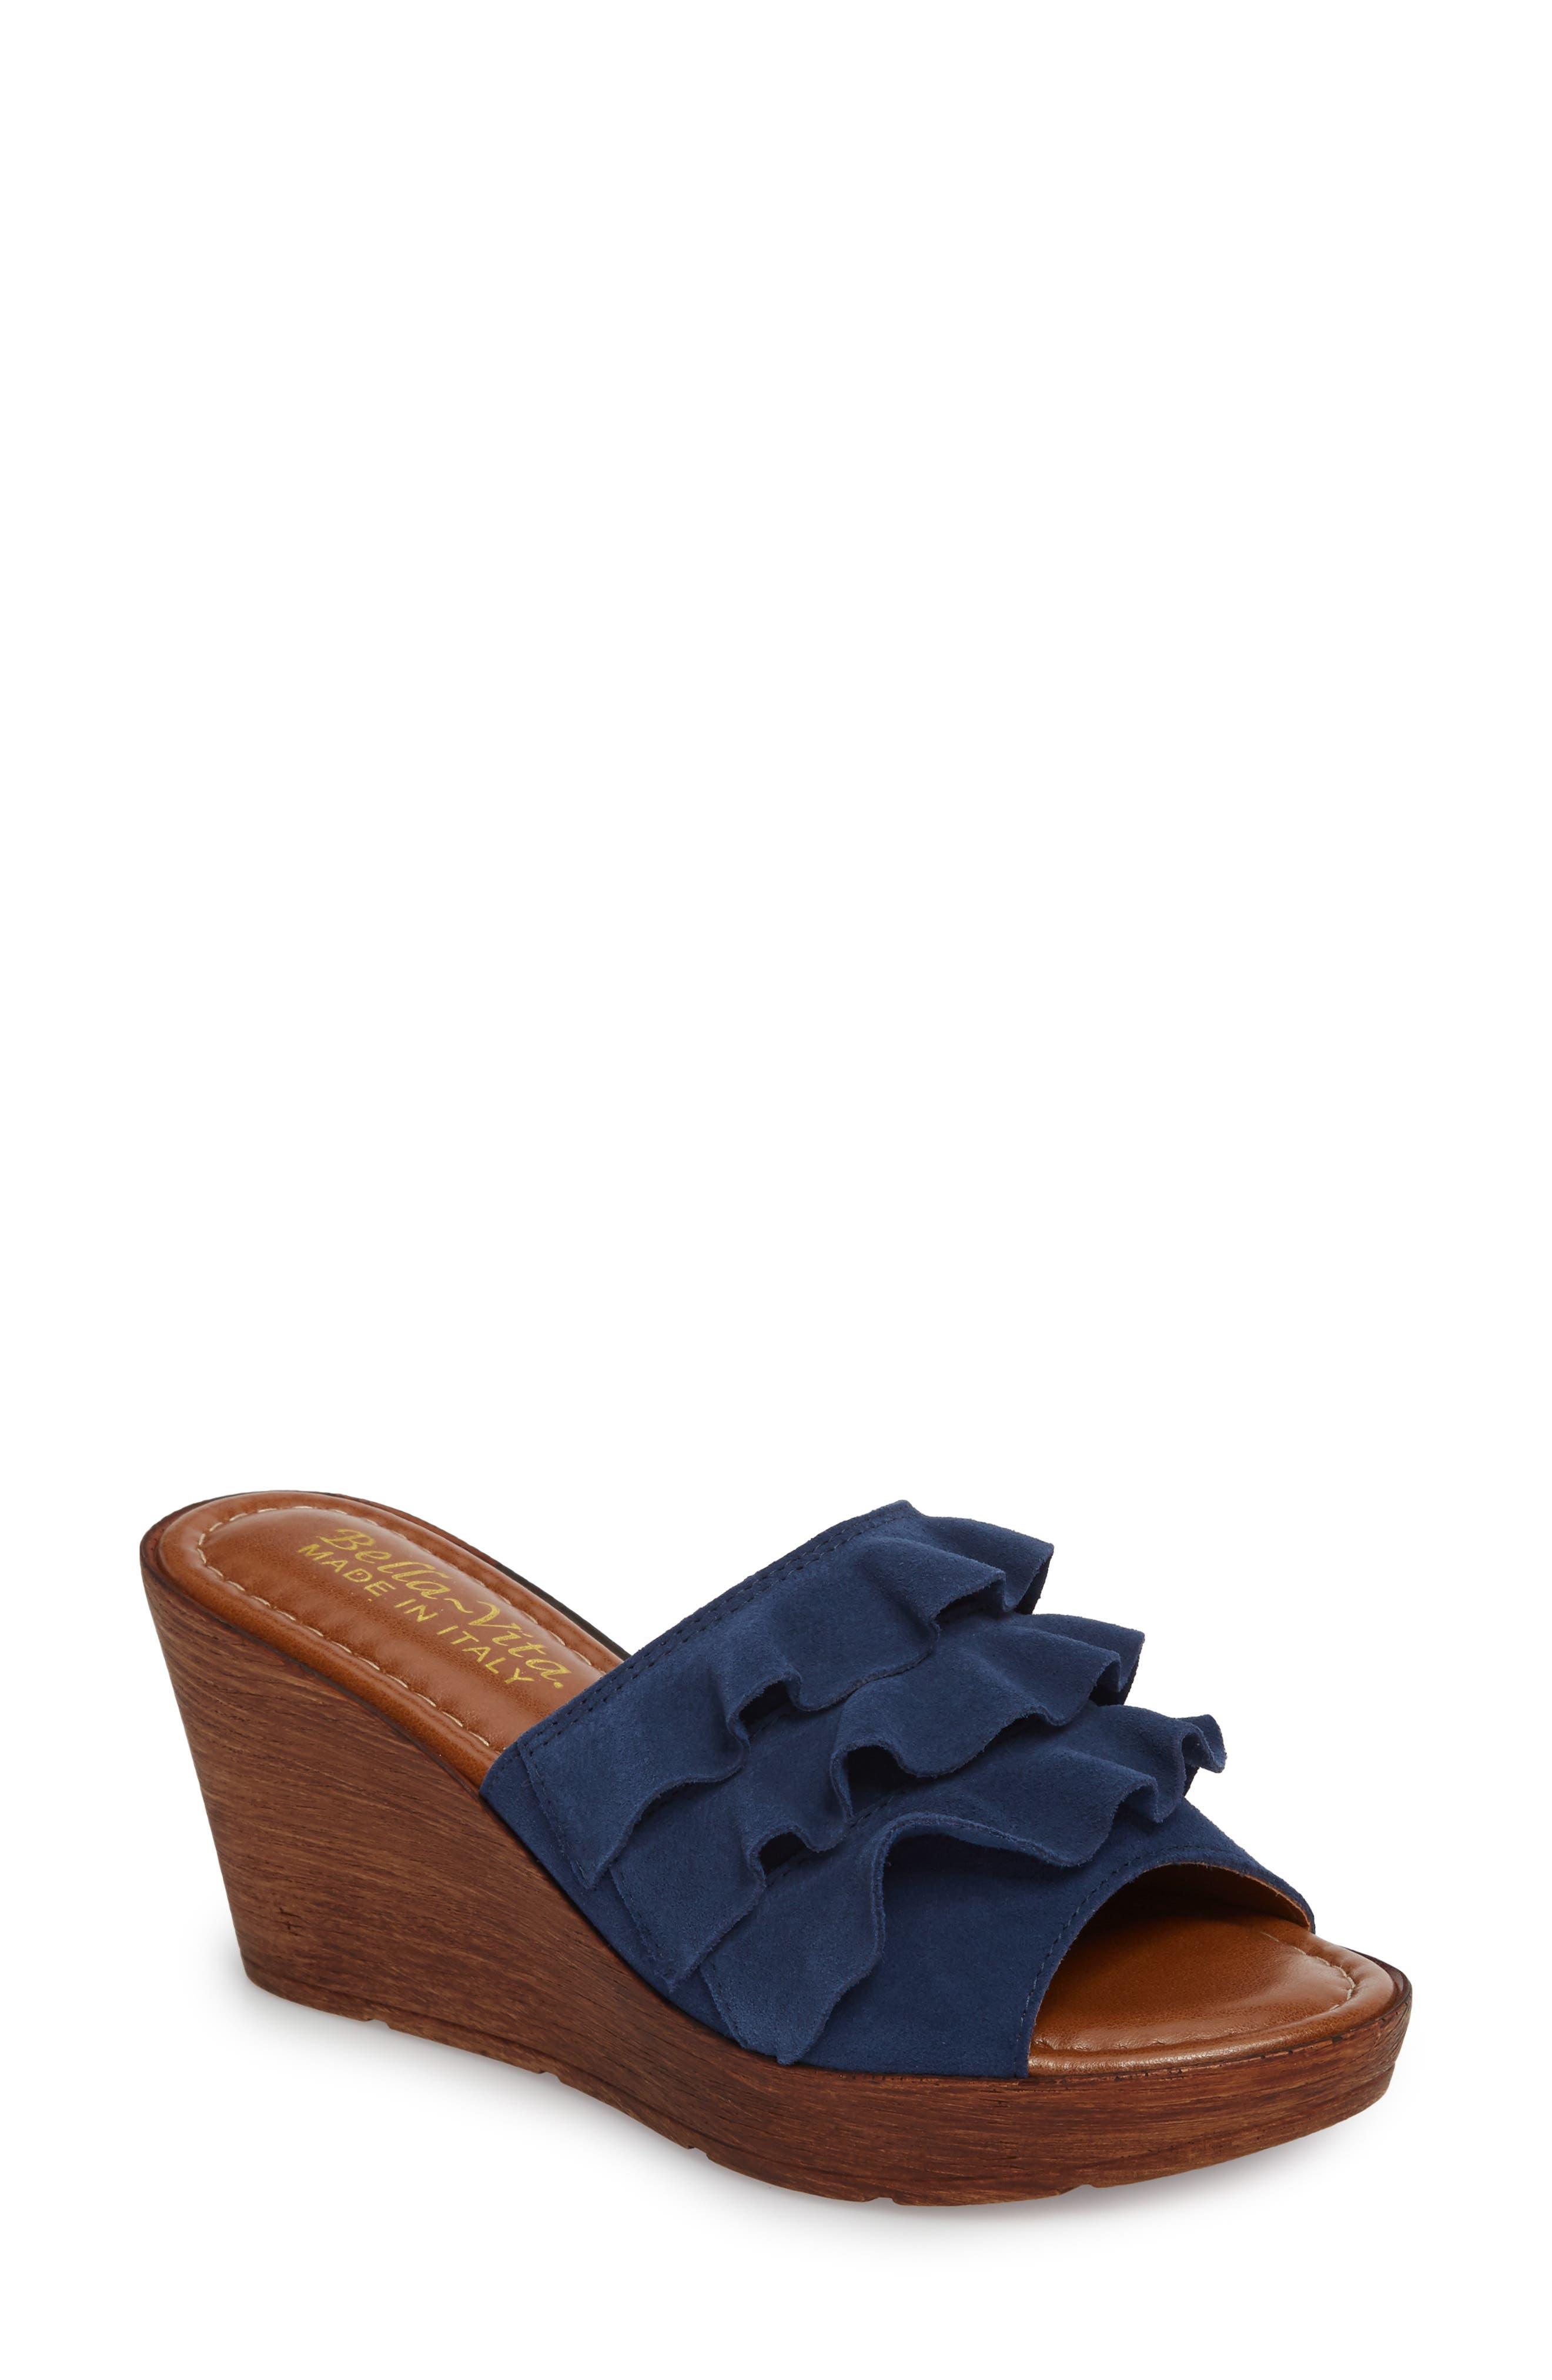 Bey Platform Wedge Sandal,                             Main thumbnail 1, color,                             NAVY SUEDE